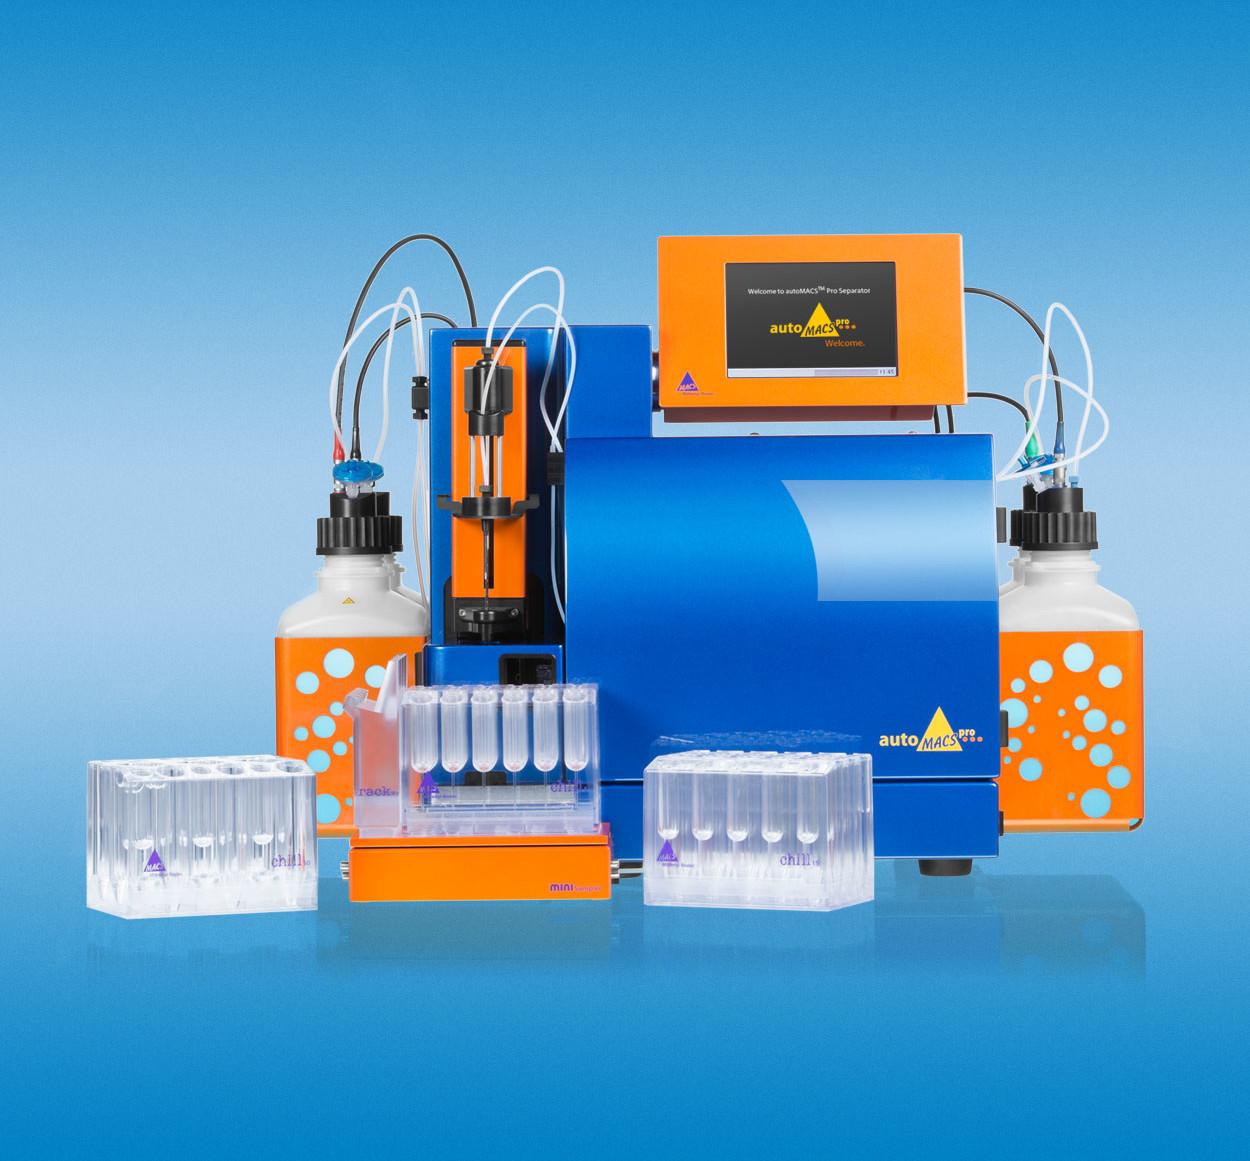 autoMACS Pro Separator